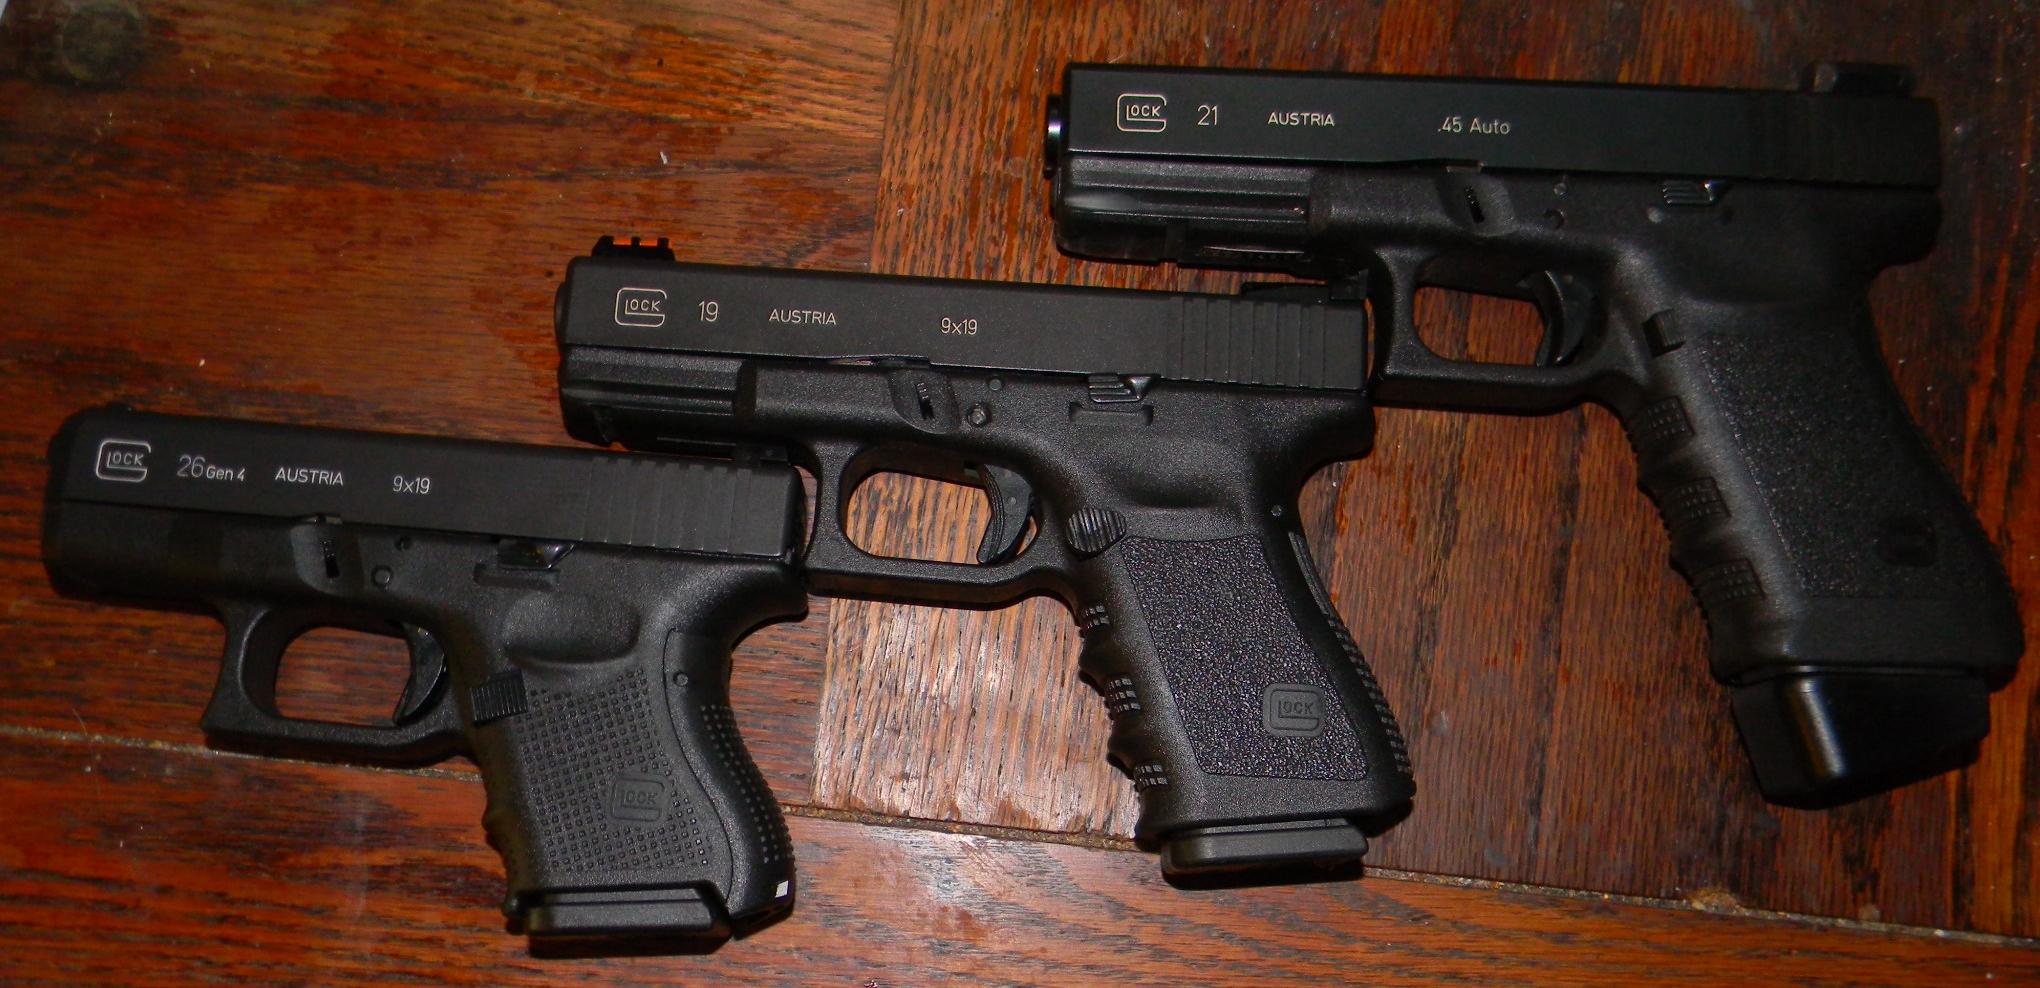 Baby Glock 40 Glock 26 Semi Automatic Pistol Austria Top Ten 40